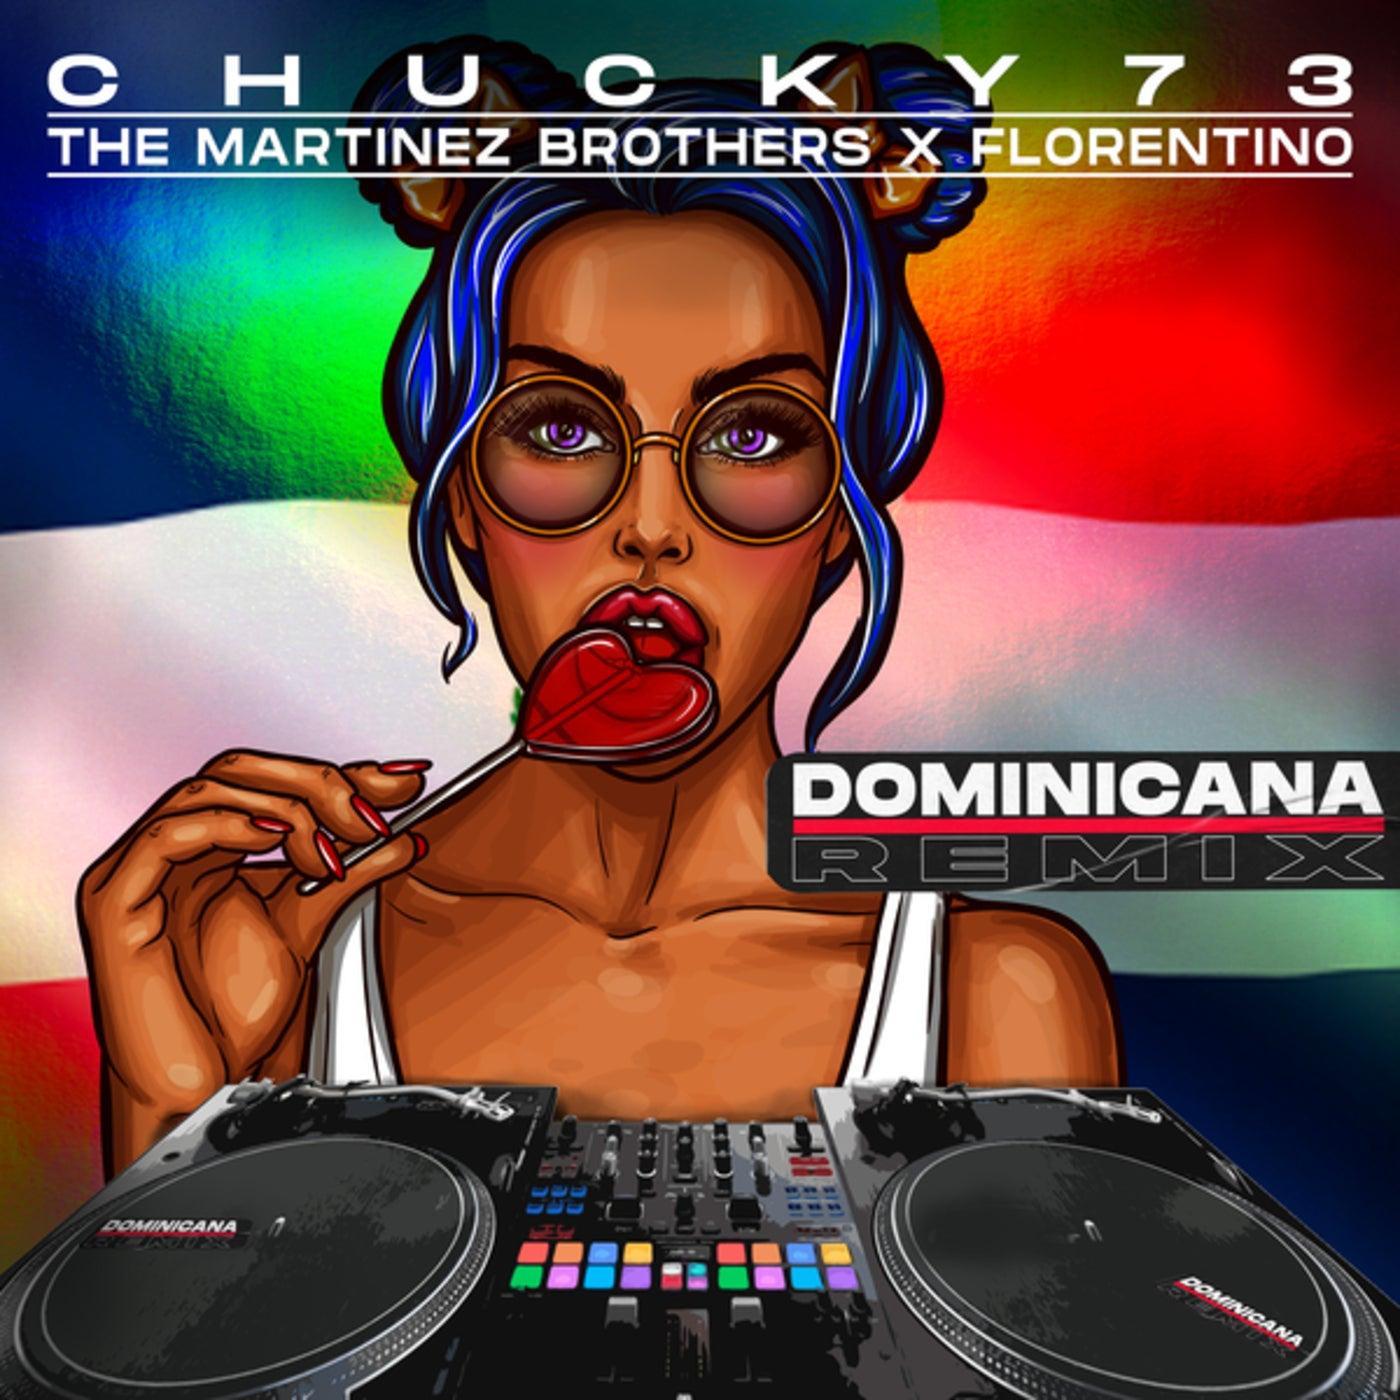 Dominicana (The Martinez Brothers + Florentino Remix)